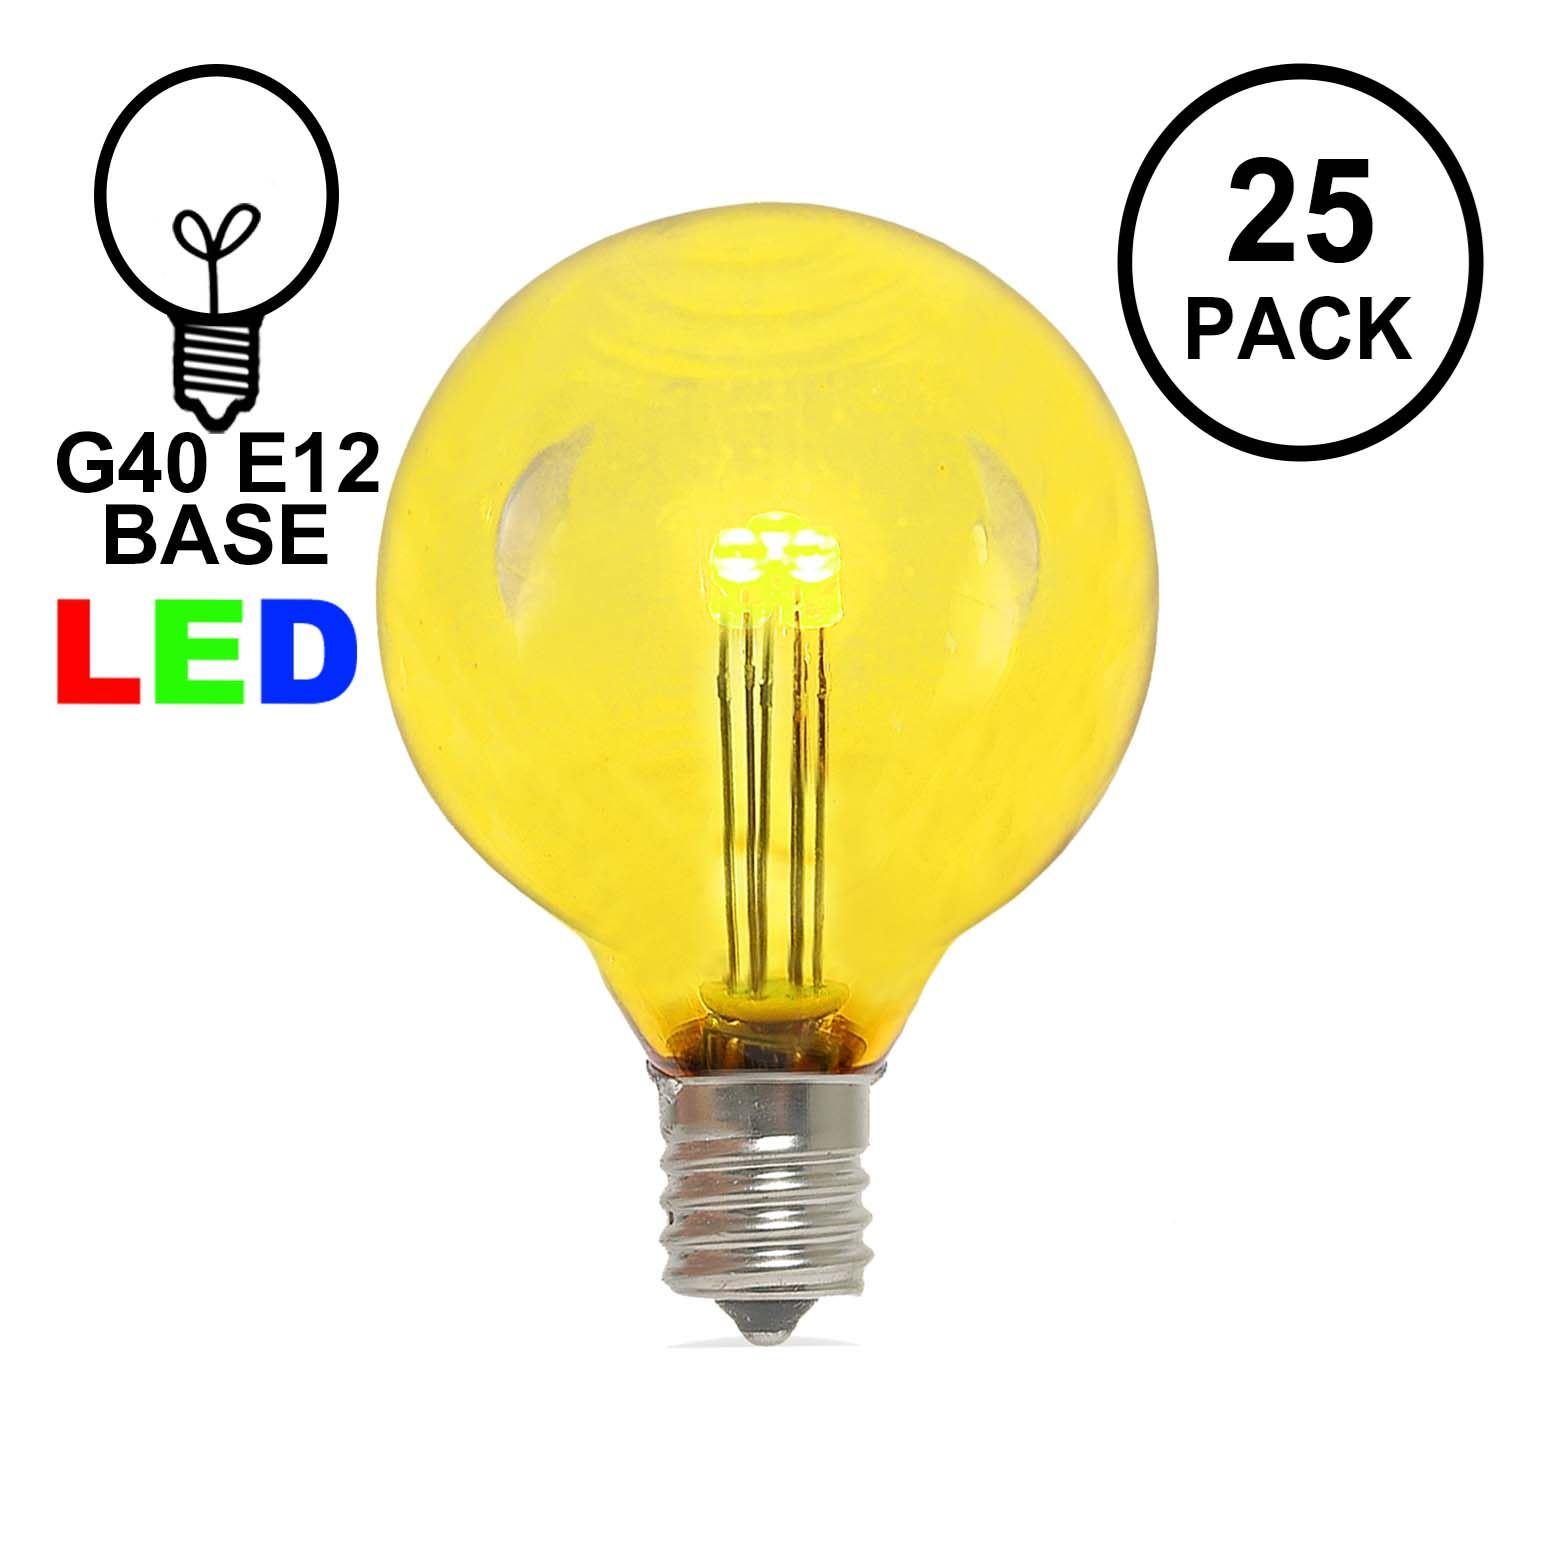 Yellow LED G40 Glass Globe Light Bulbs - Novelty Lights